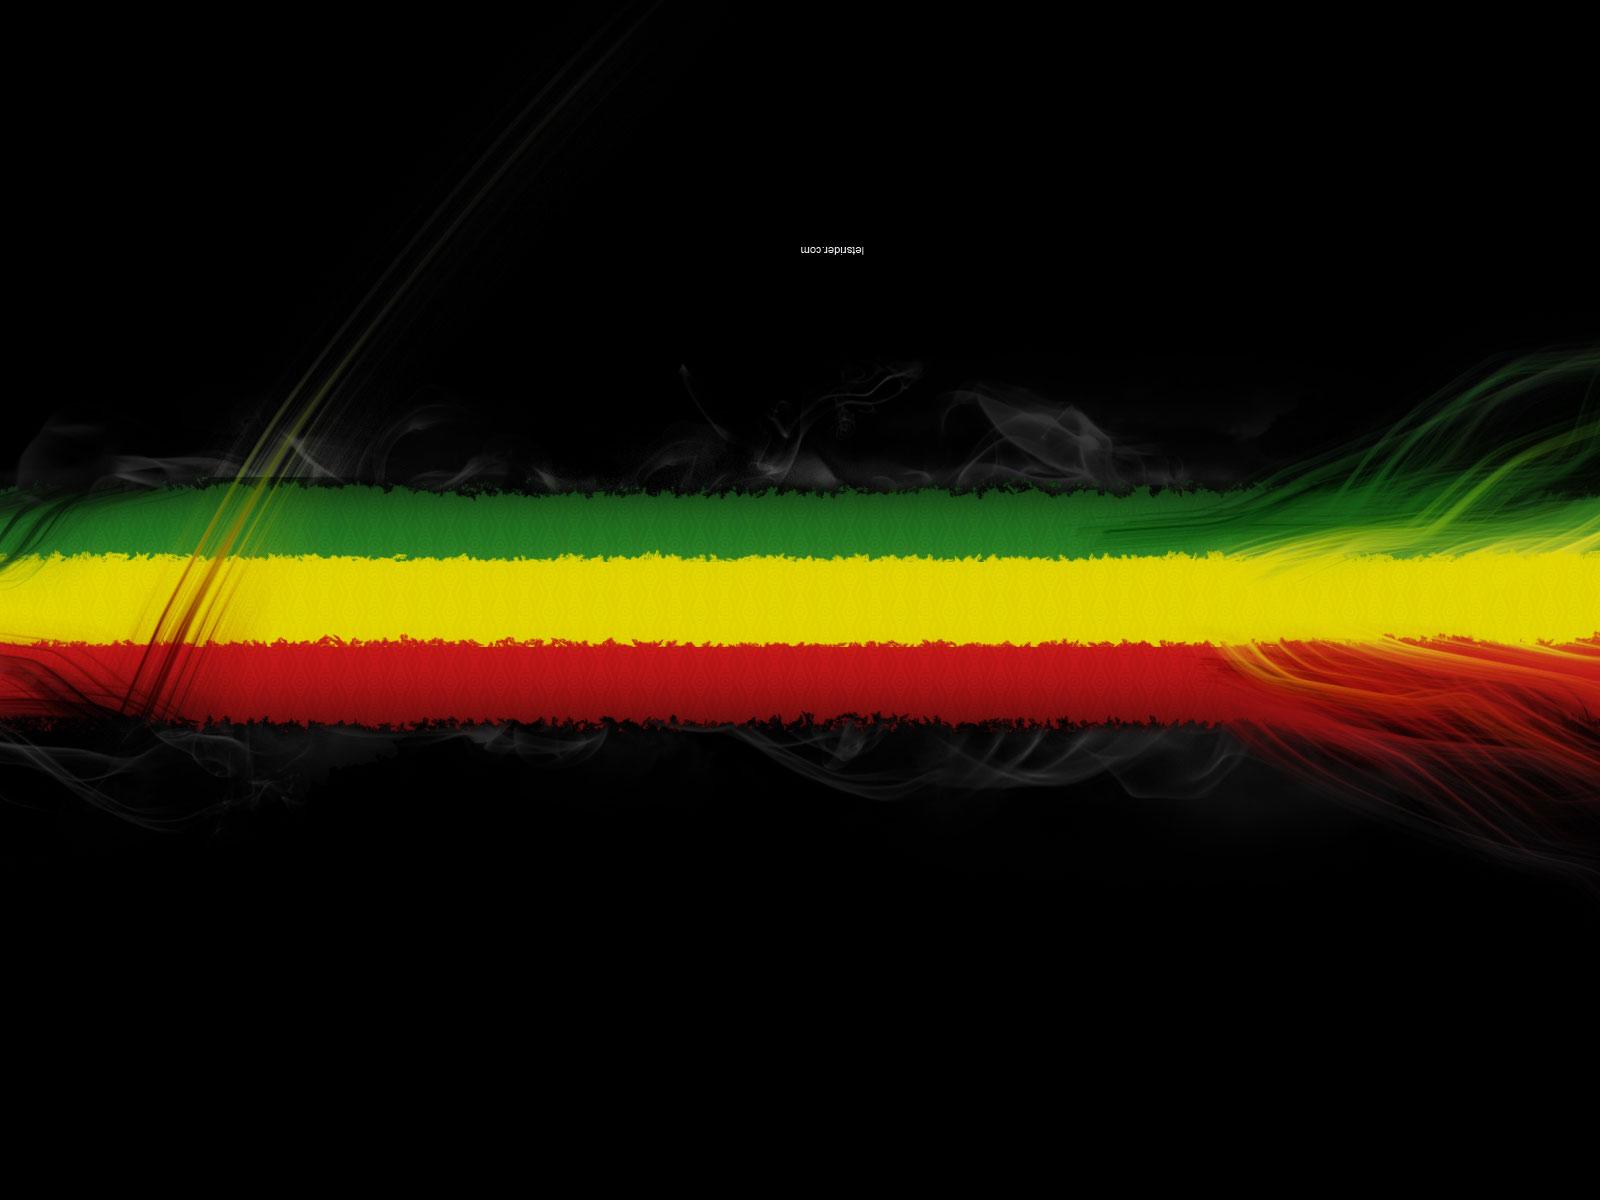 Hd wallpaper reggae - Reggae Wallpaper Hd Wallpapersafari